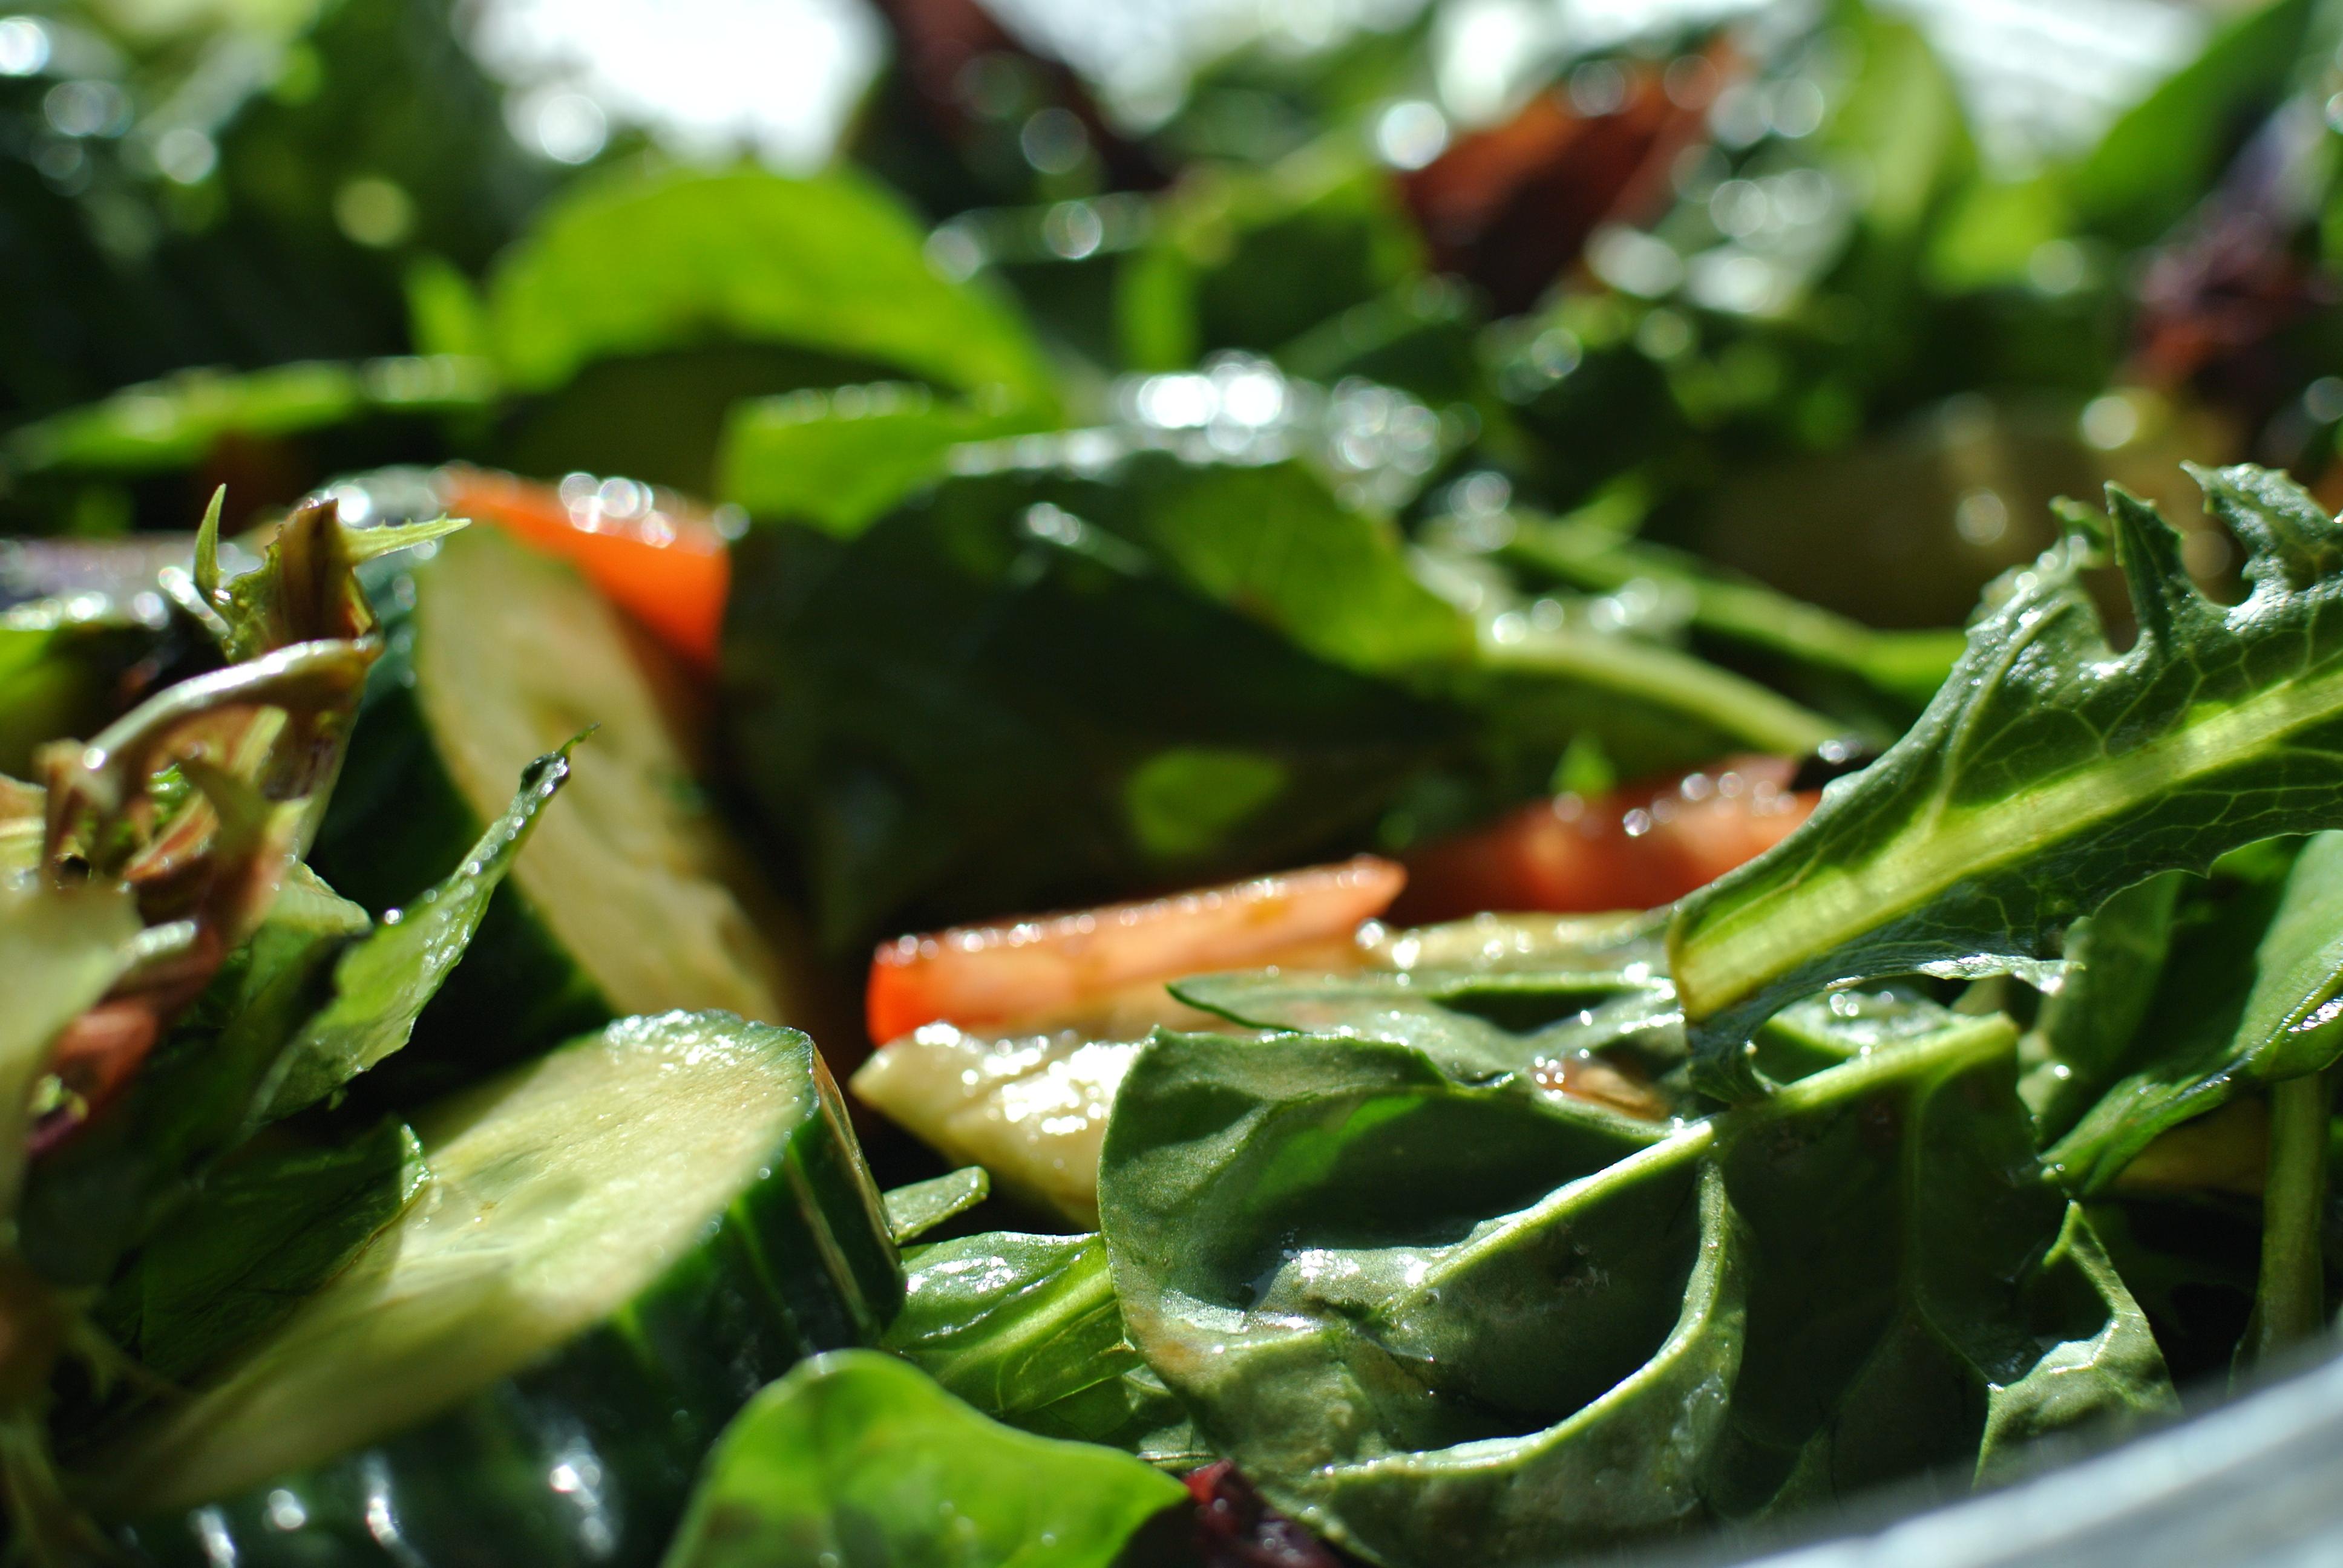 Sharon Vt Whole Foods